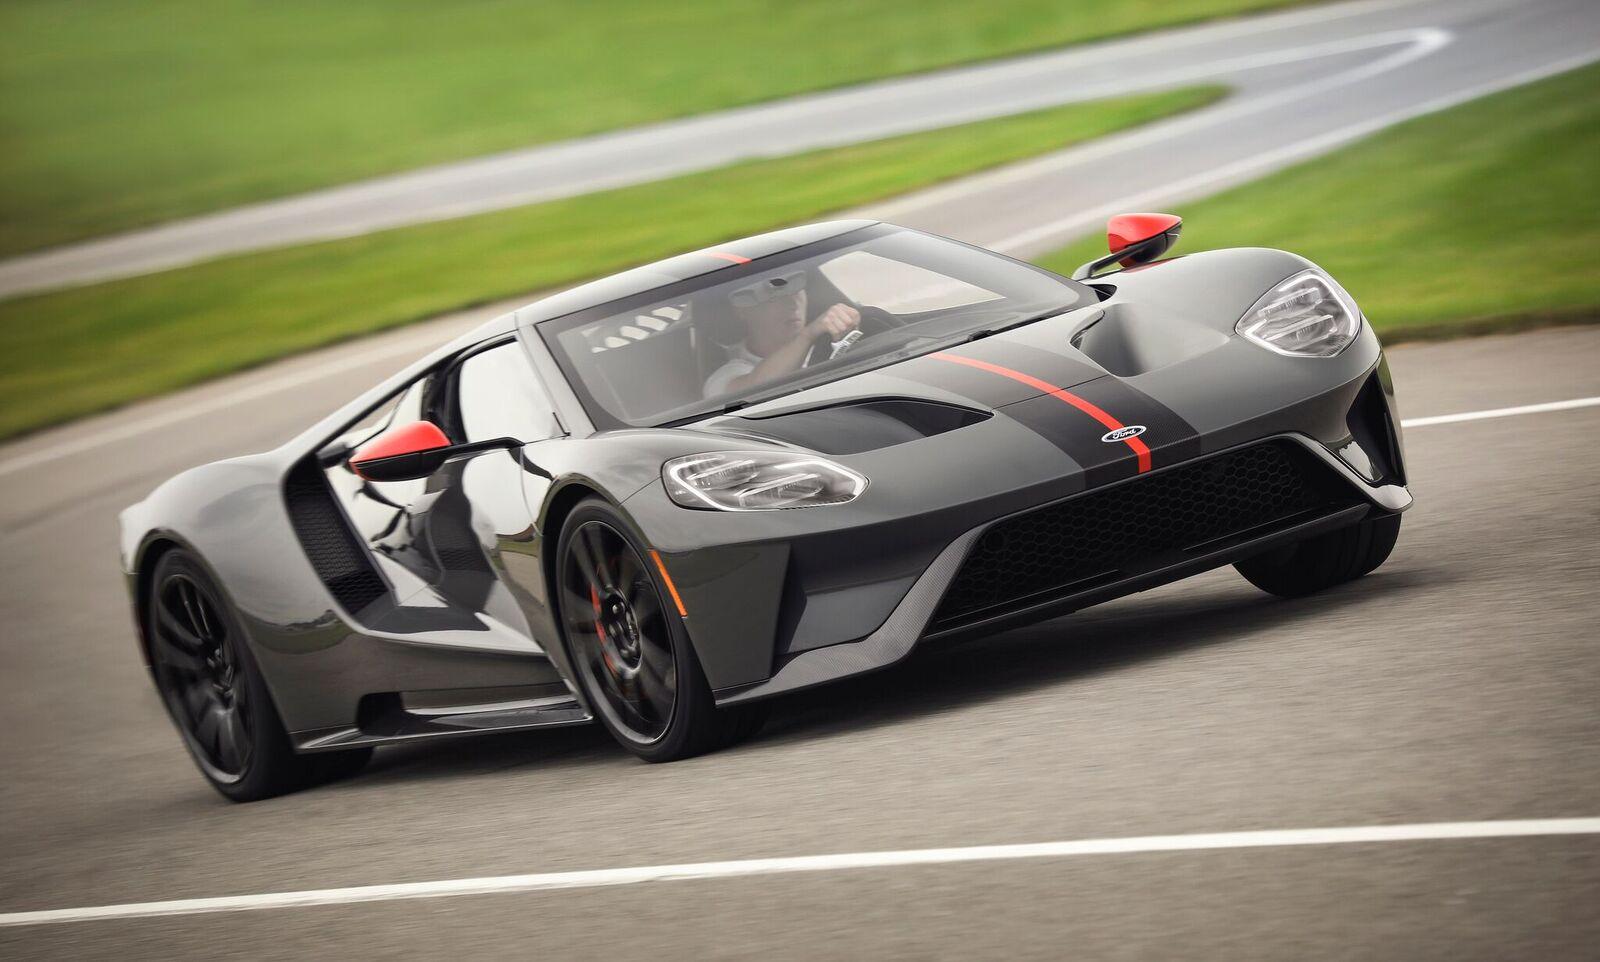 2019FordGTCarbonstartup via @carsfera www.carsfera.com #autonomous #cars #selfdriving #vehicles #future #futuristic #futurism #foresight #trends #ai #artificialintelligence #tech #testdrives #Ford #FordGTCarbon #GT #FordGT